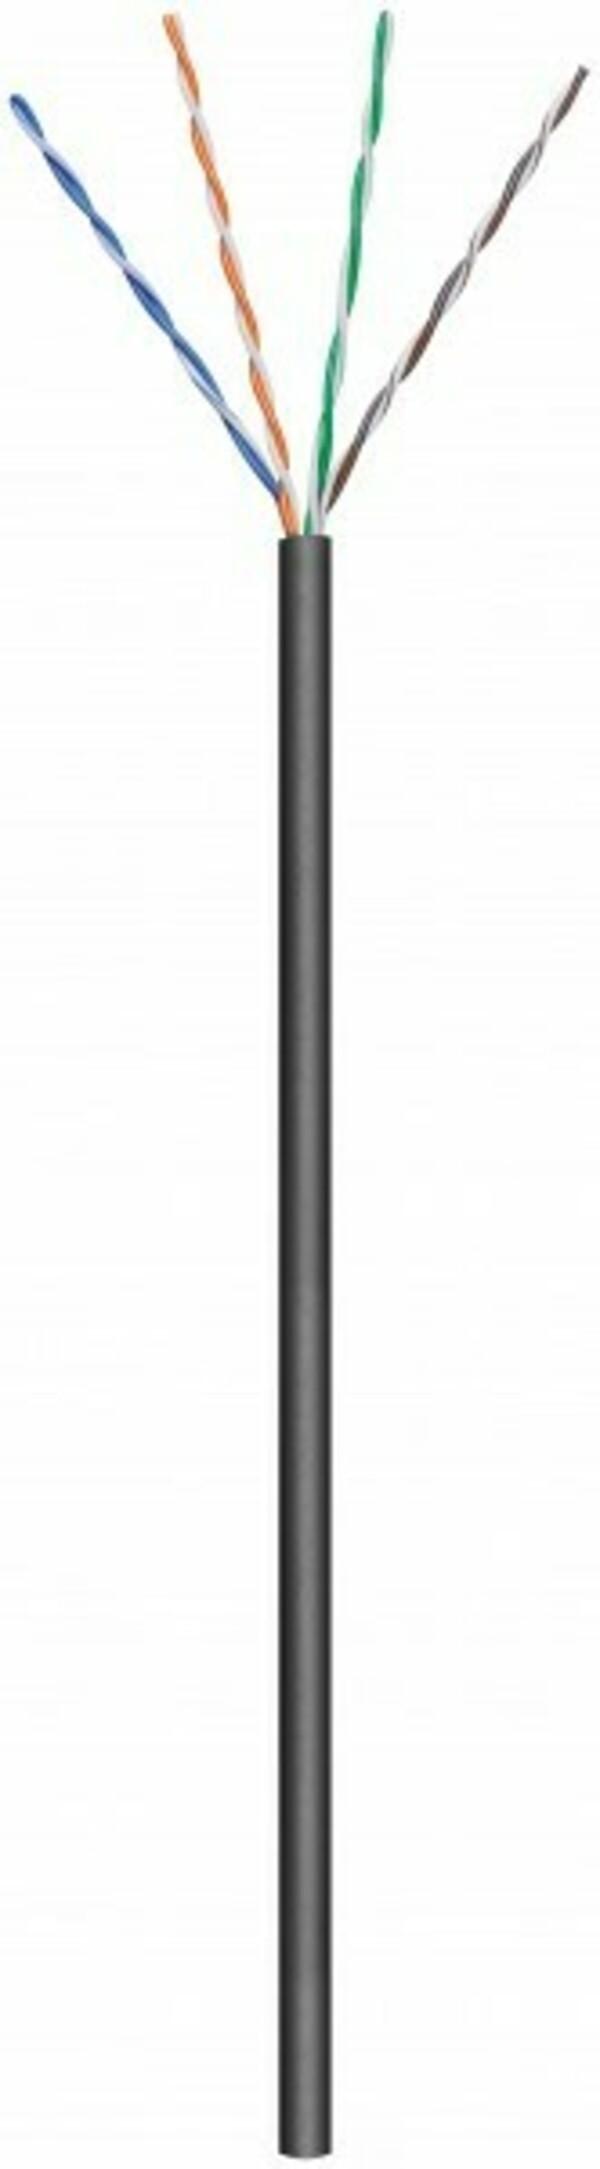 Afbeelding van CAT6 U/UTP 100m outdoor cable on a reel stranded black CCA